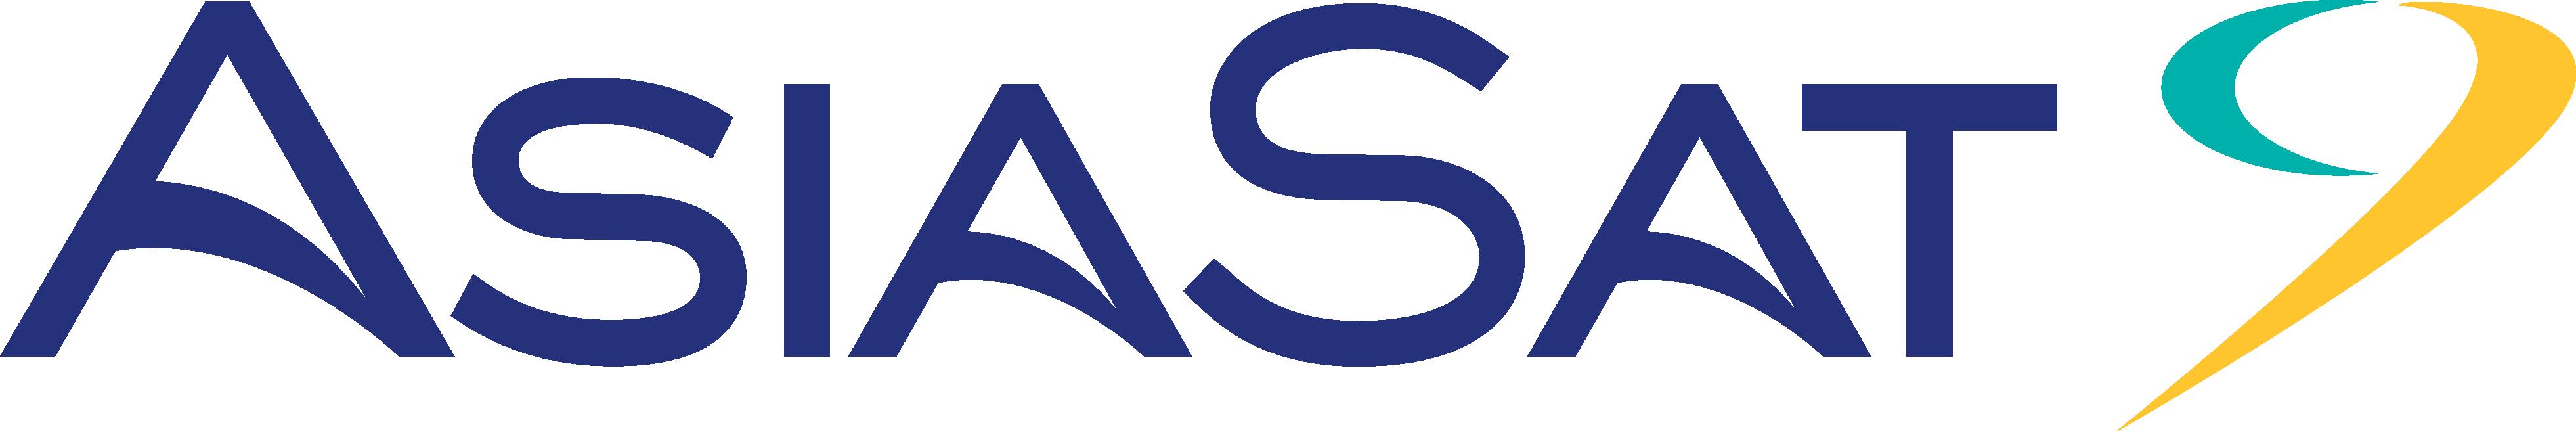 AsiaSat 9 logo